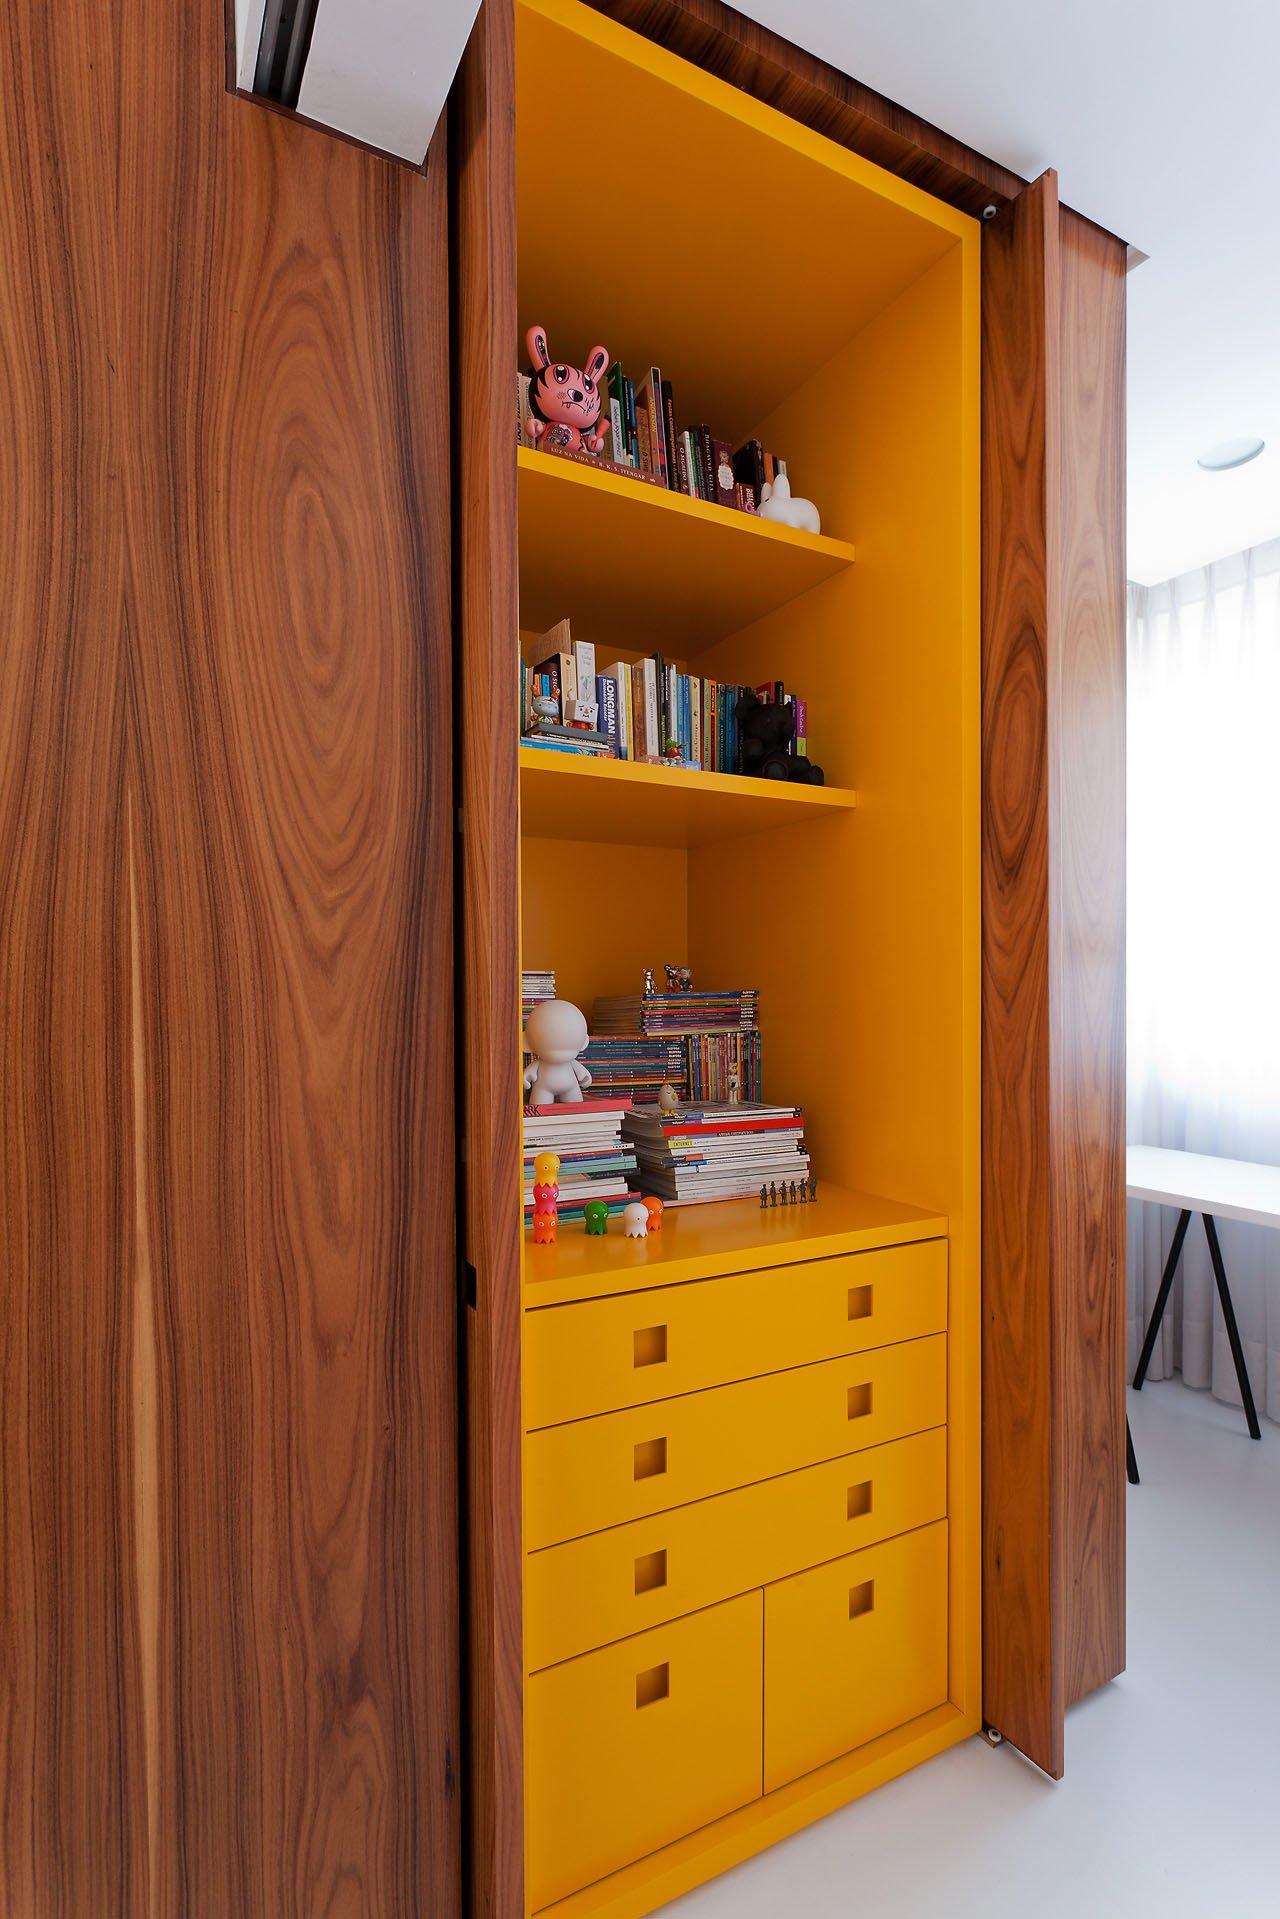 Apartment-Ahu-61-12